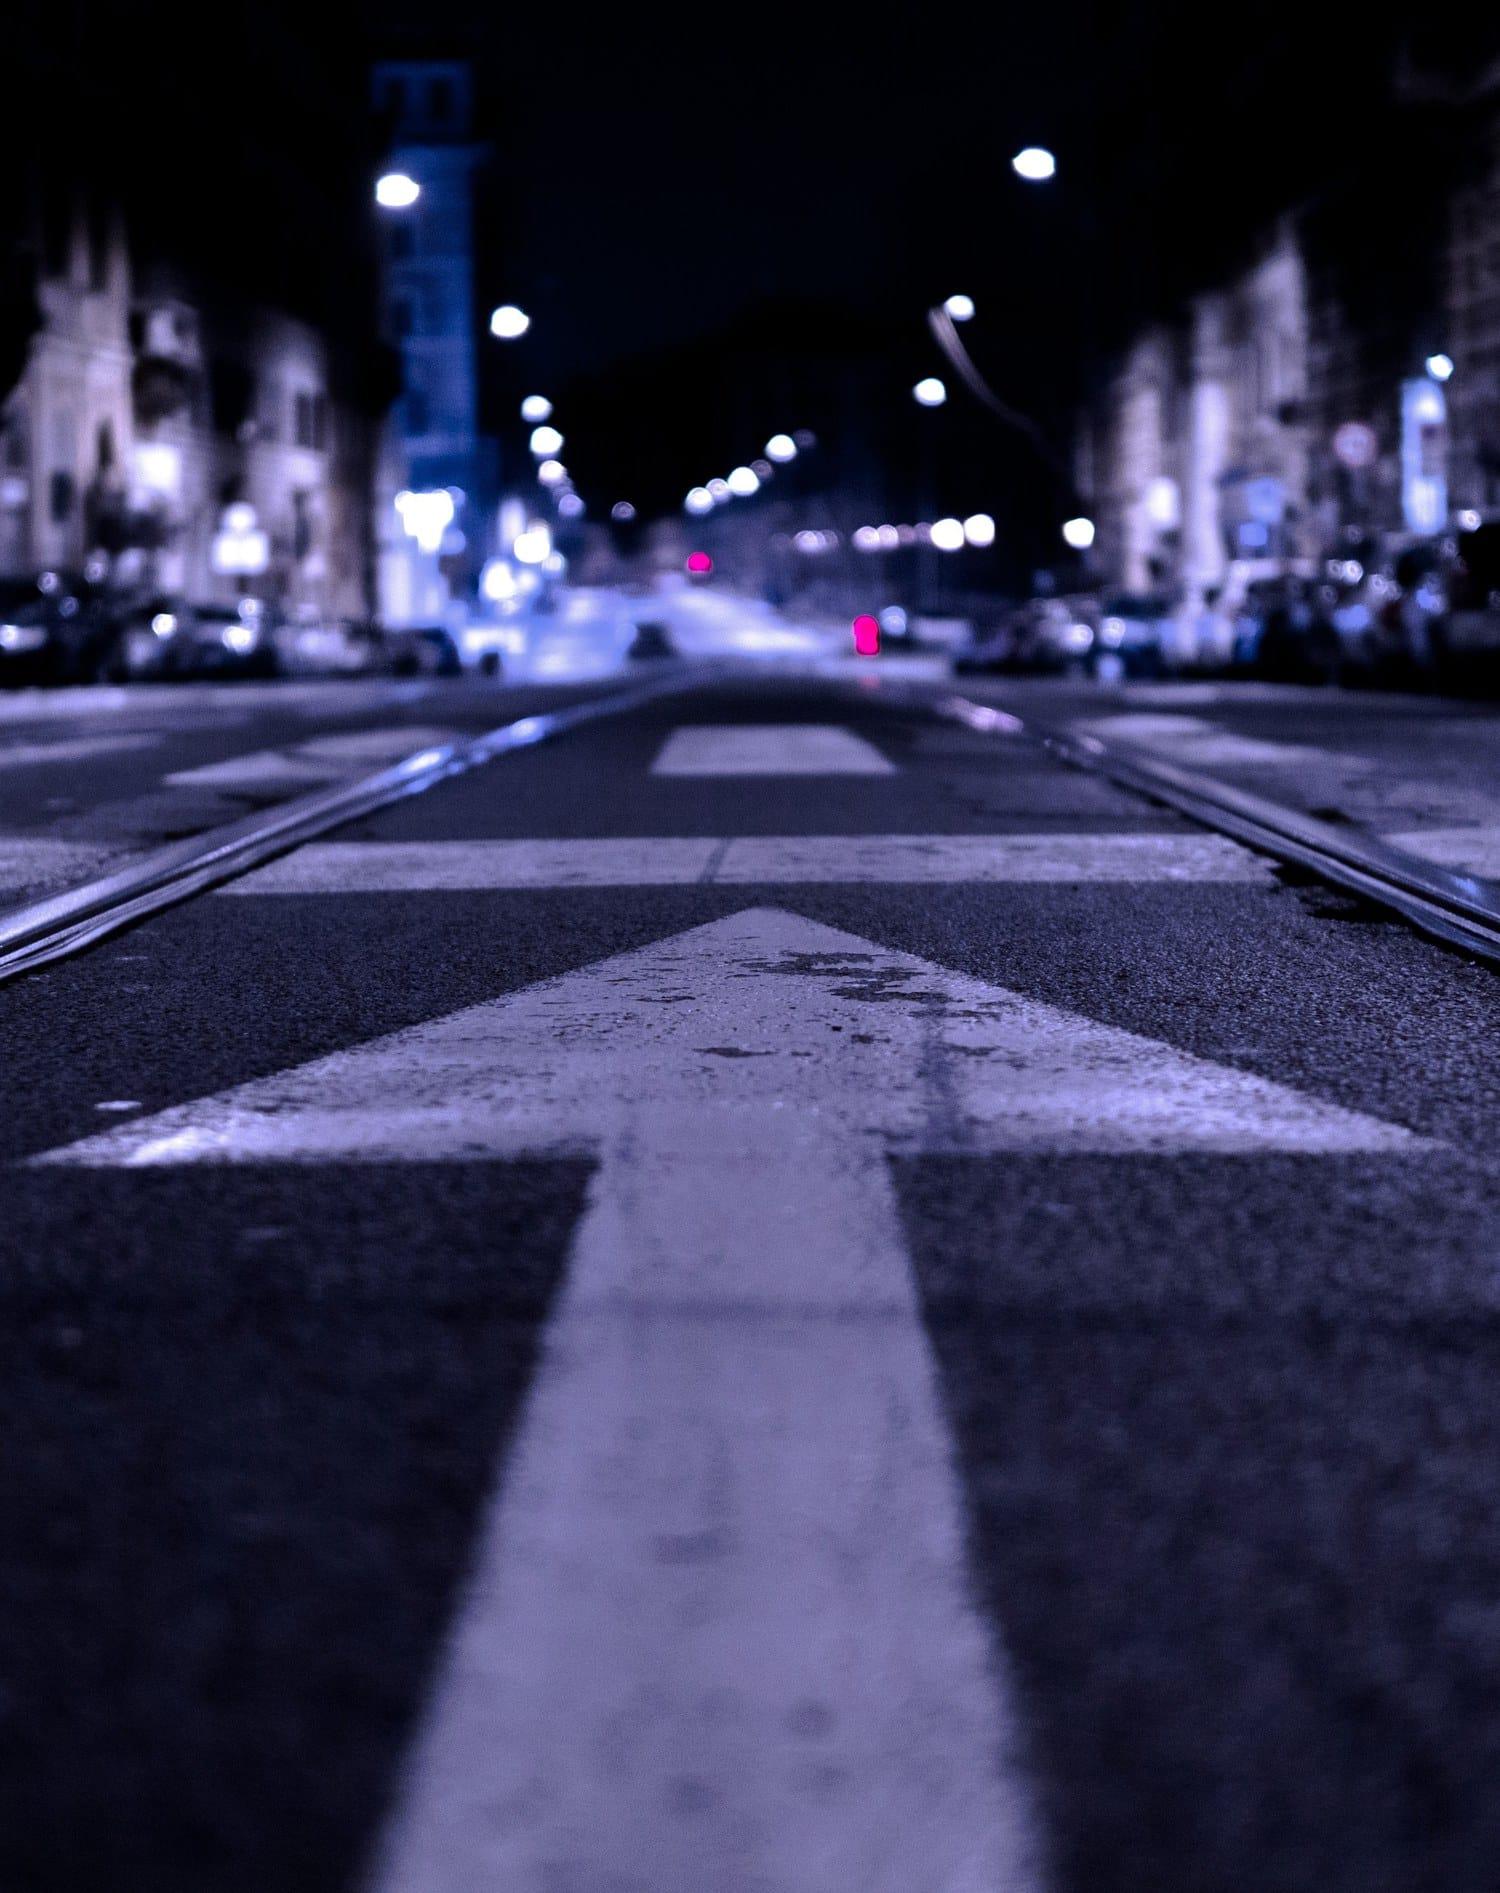 Flecha sobre el asfalto dirigiendo mirada